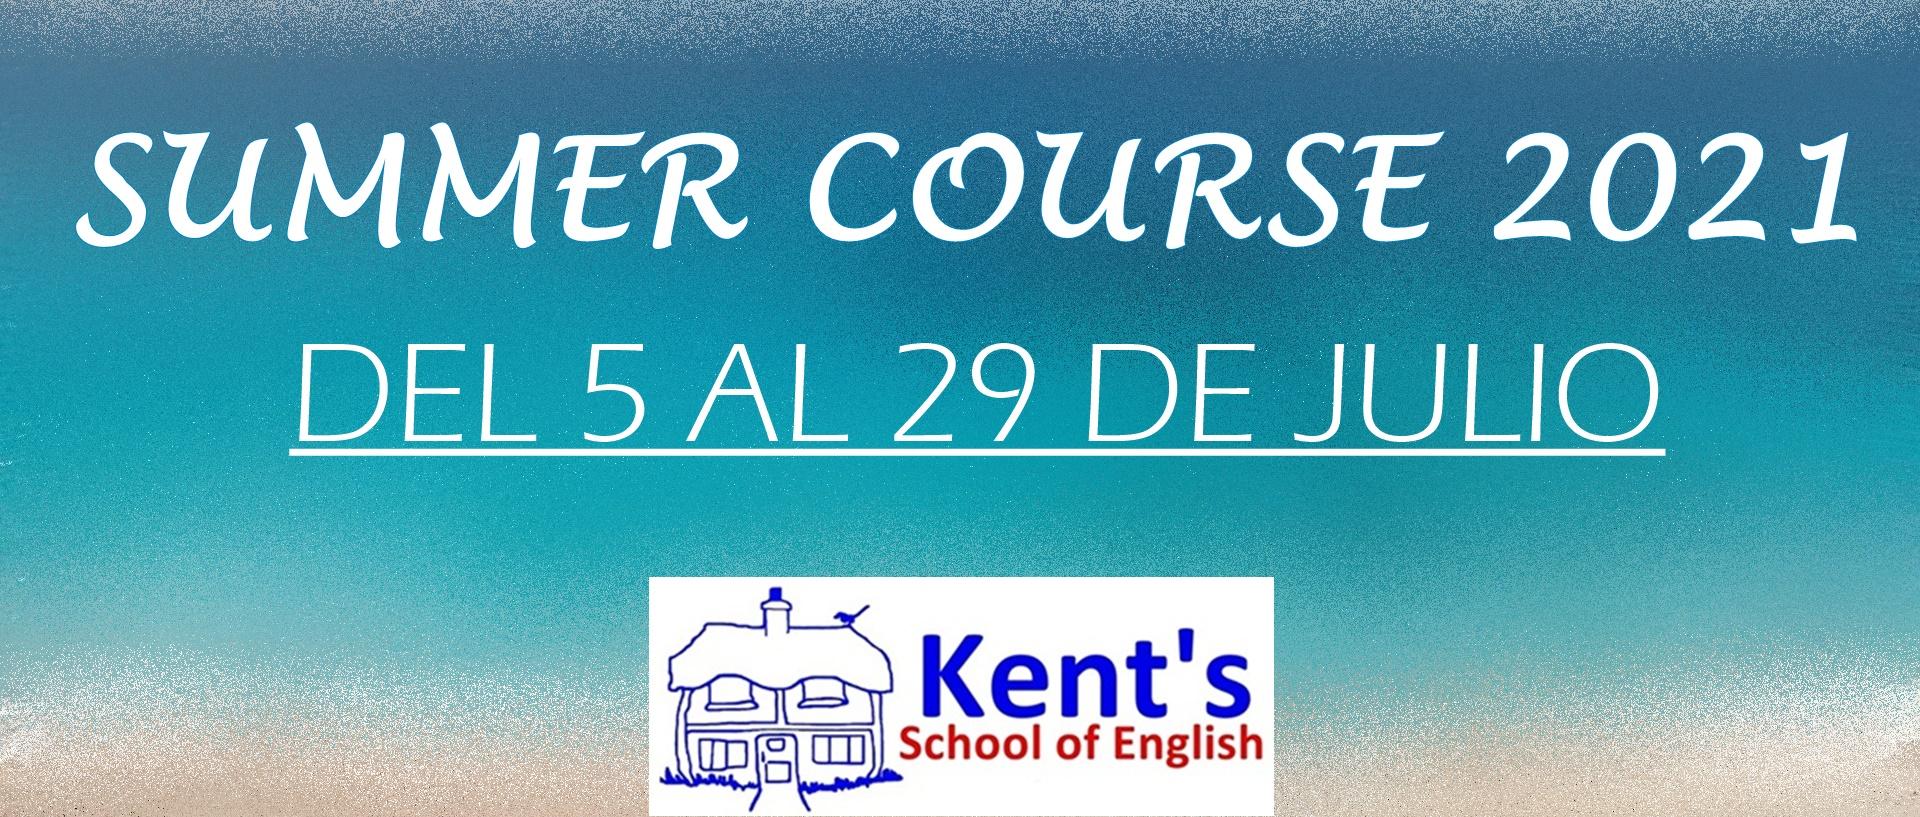 Kent's School of English Academia en Rivas